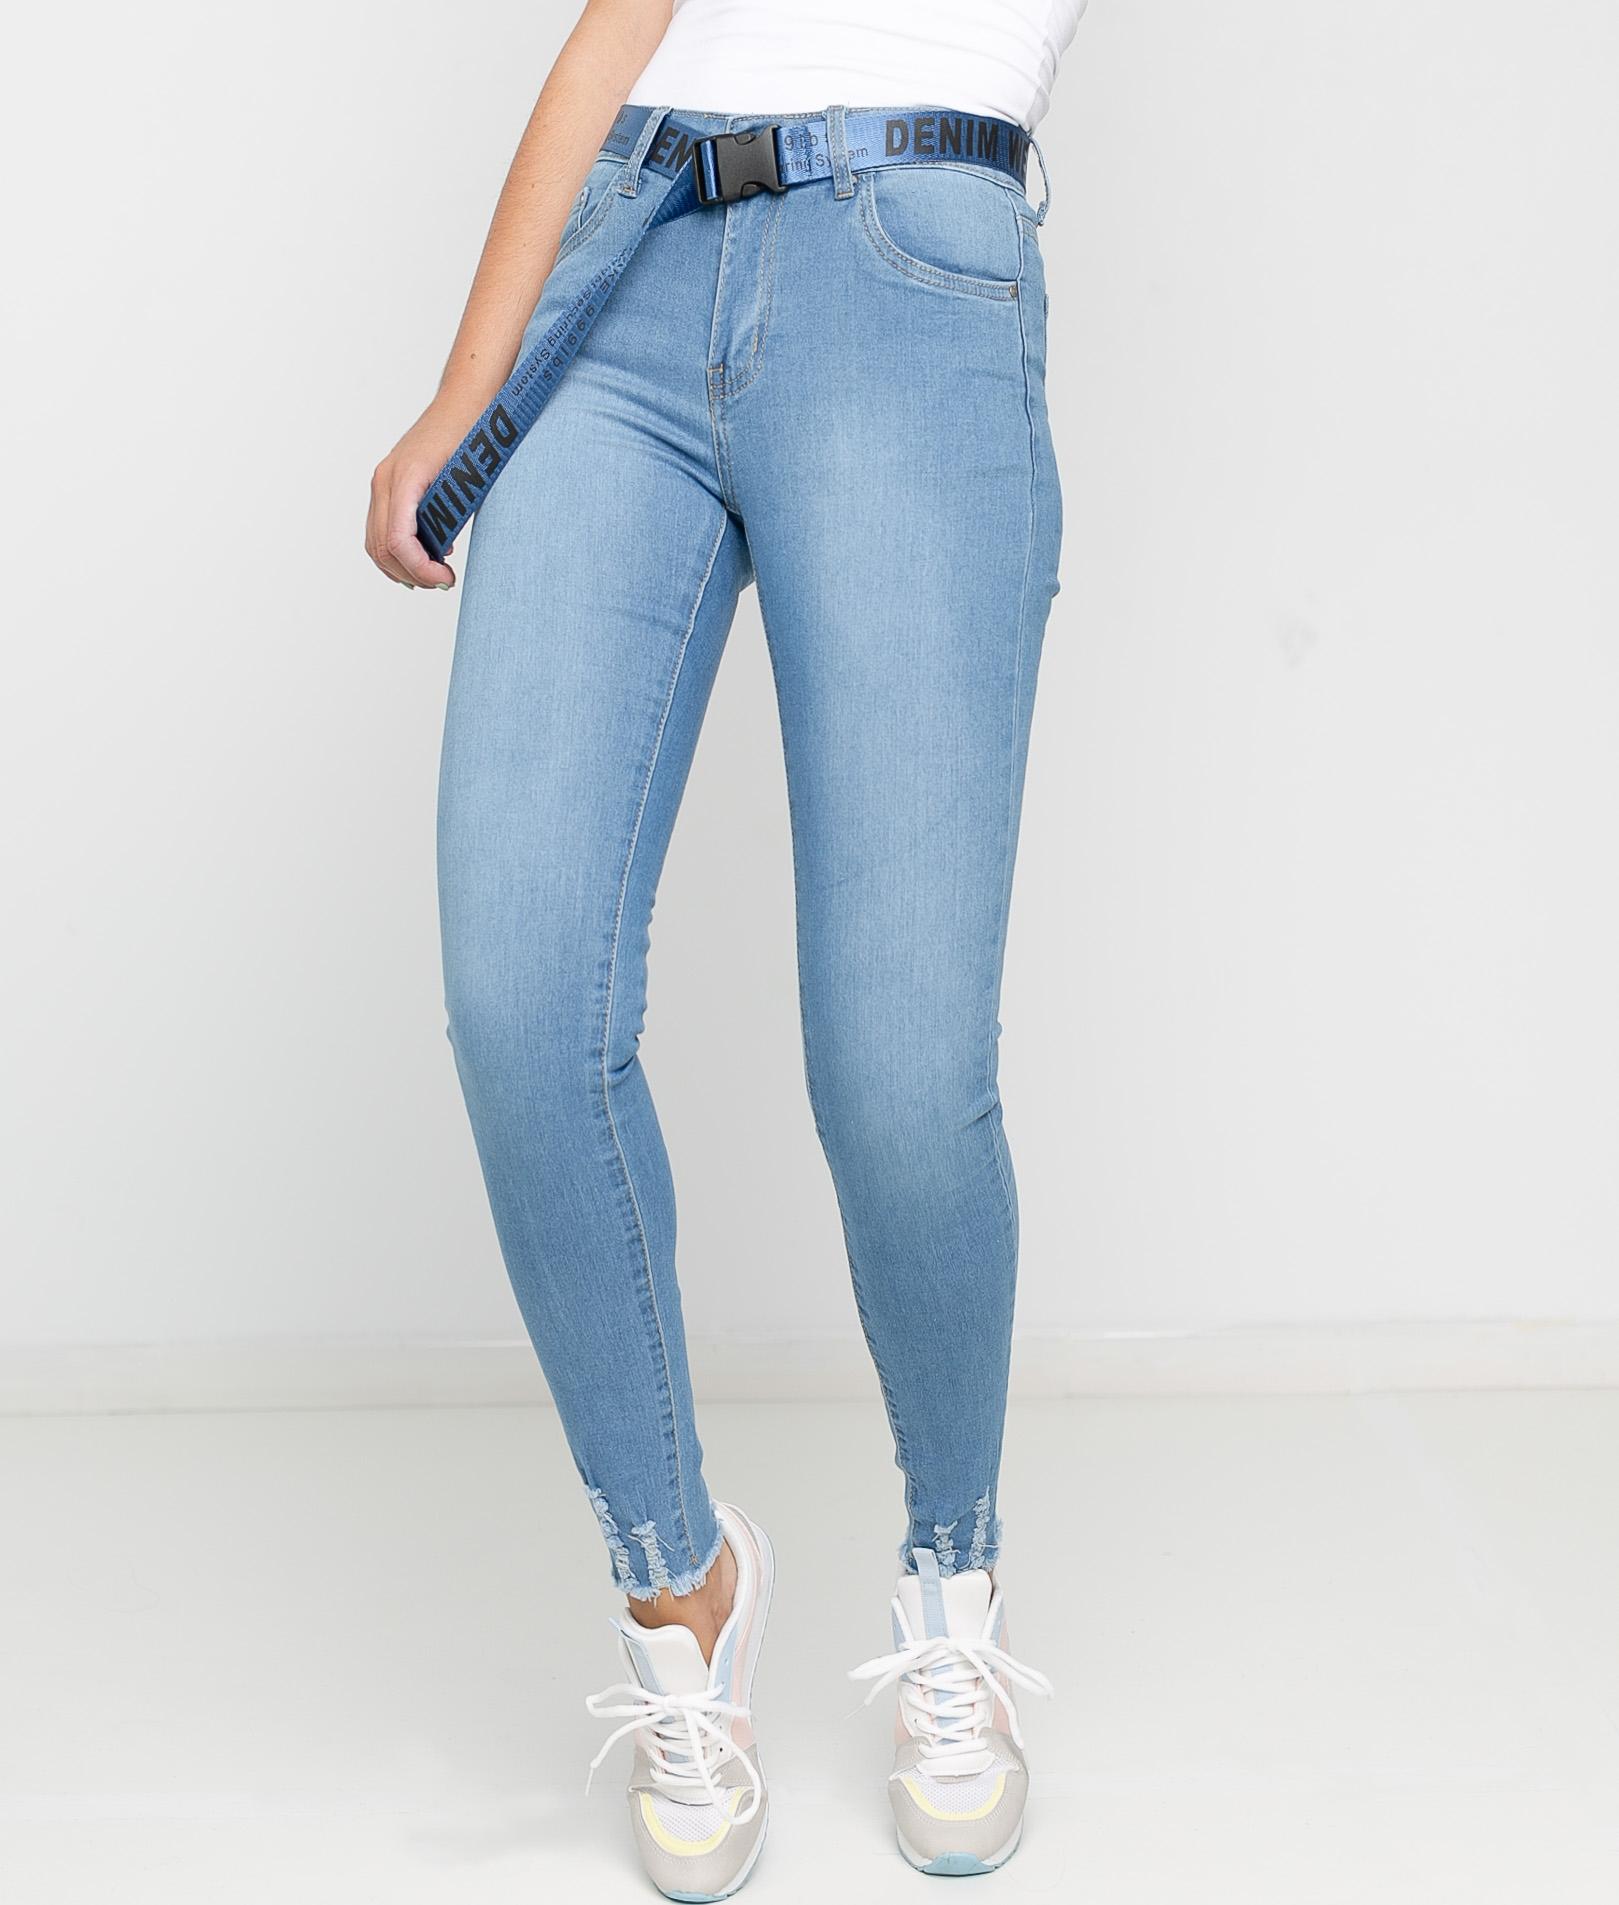 Pantaloni Klean - Denim